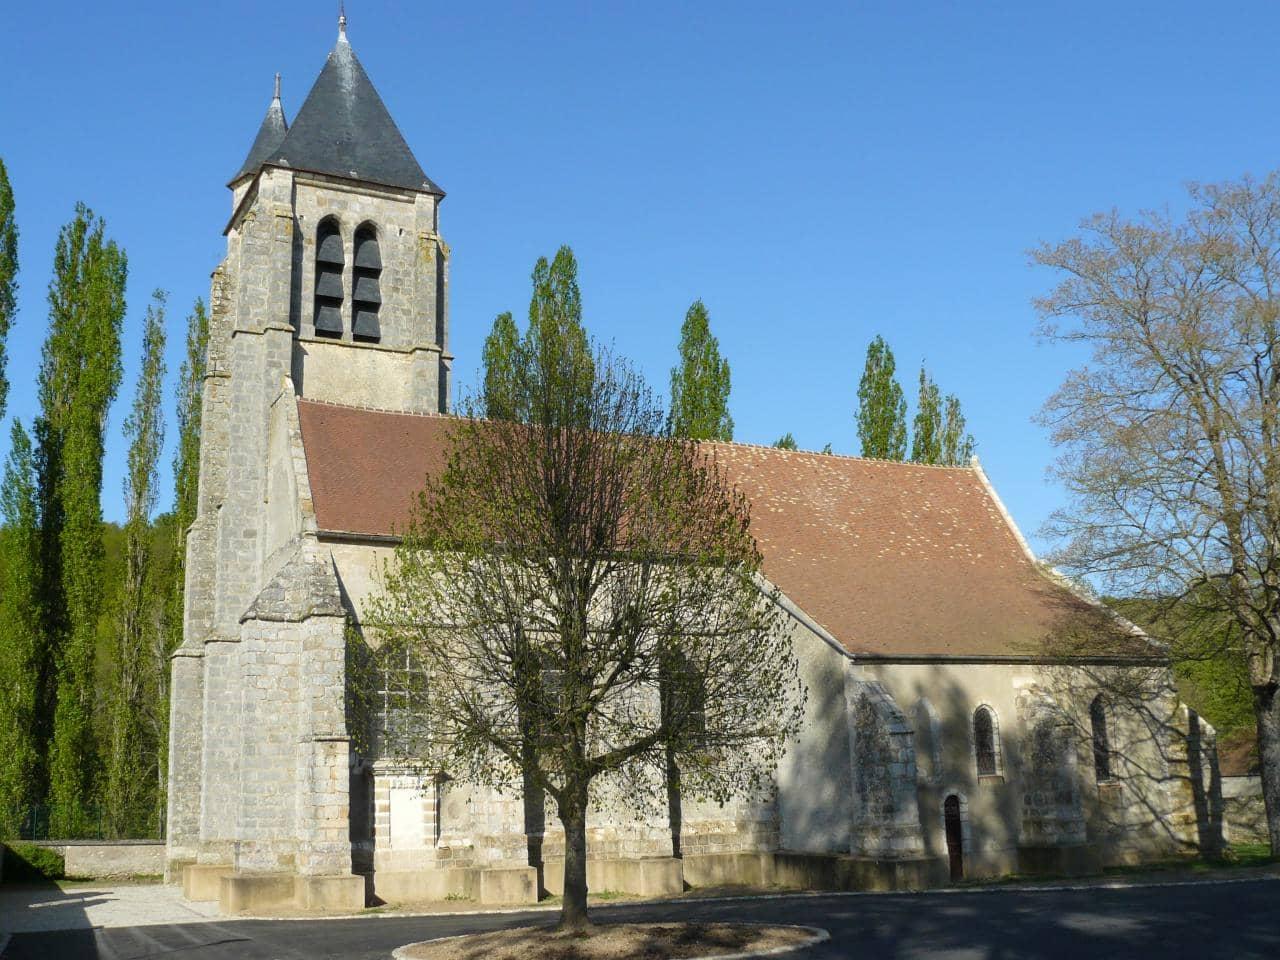 Eglise de Sainte Mesme